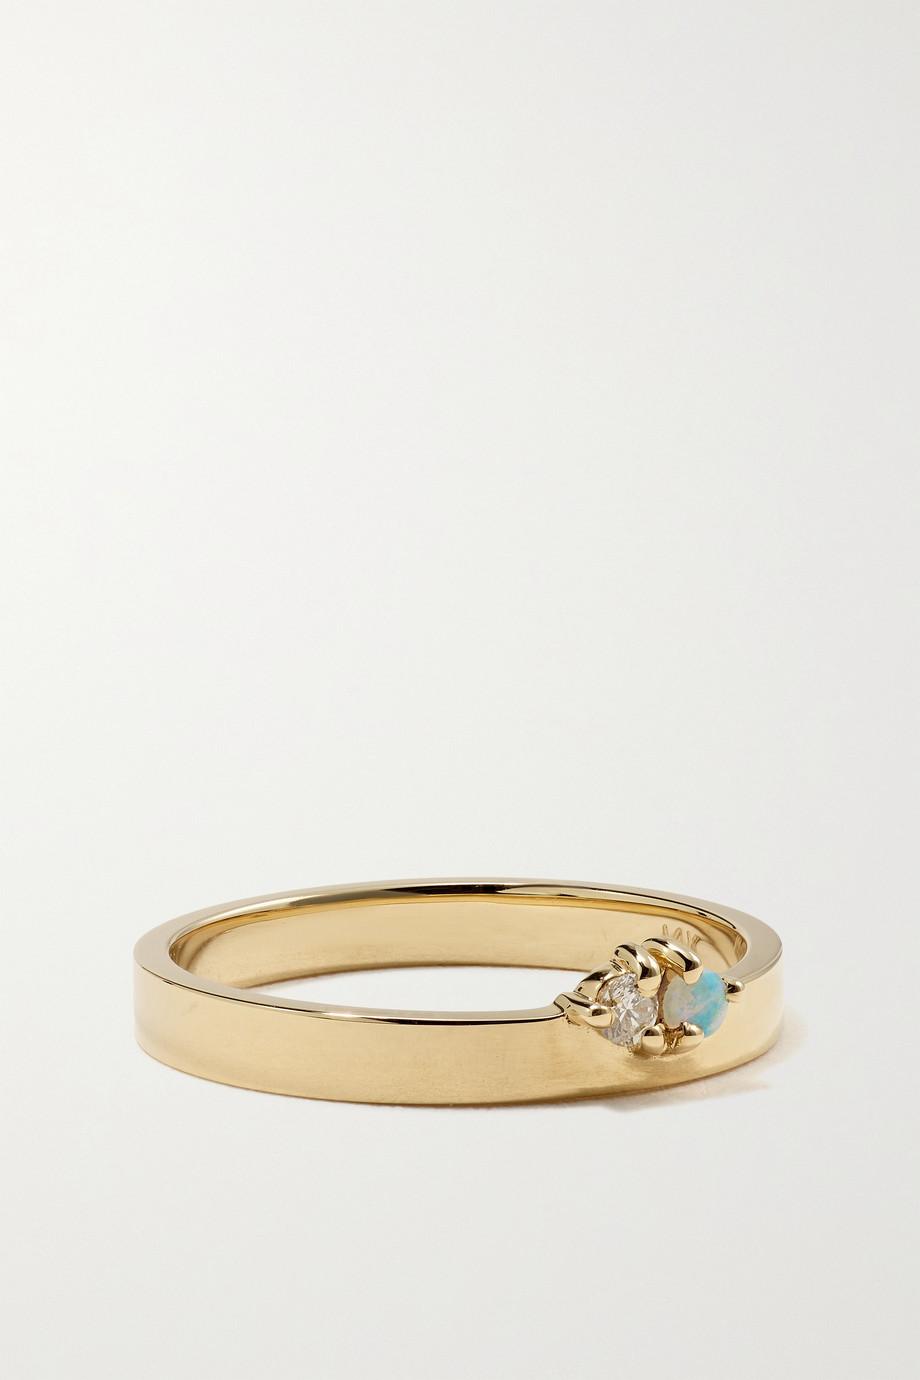 Wwake Overton 14-karat gold, diamond and opal ring